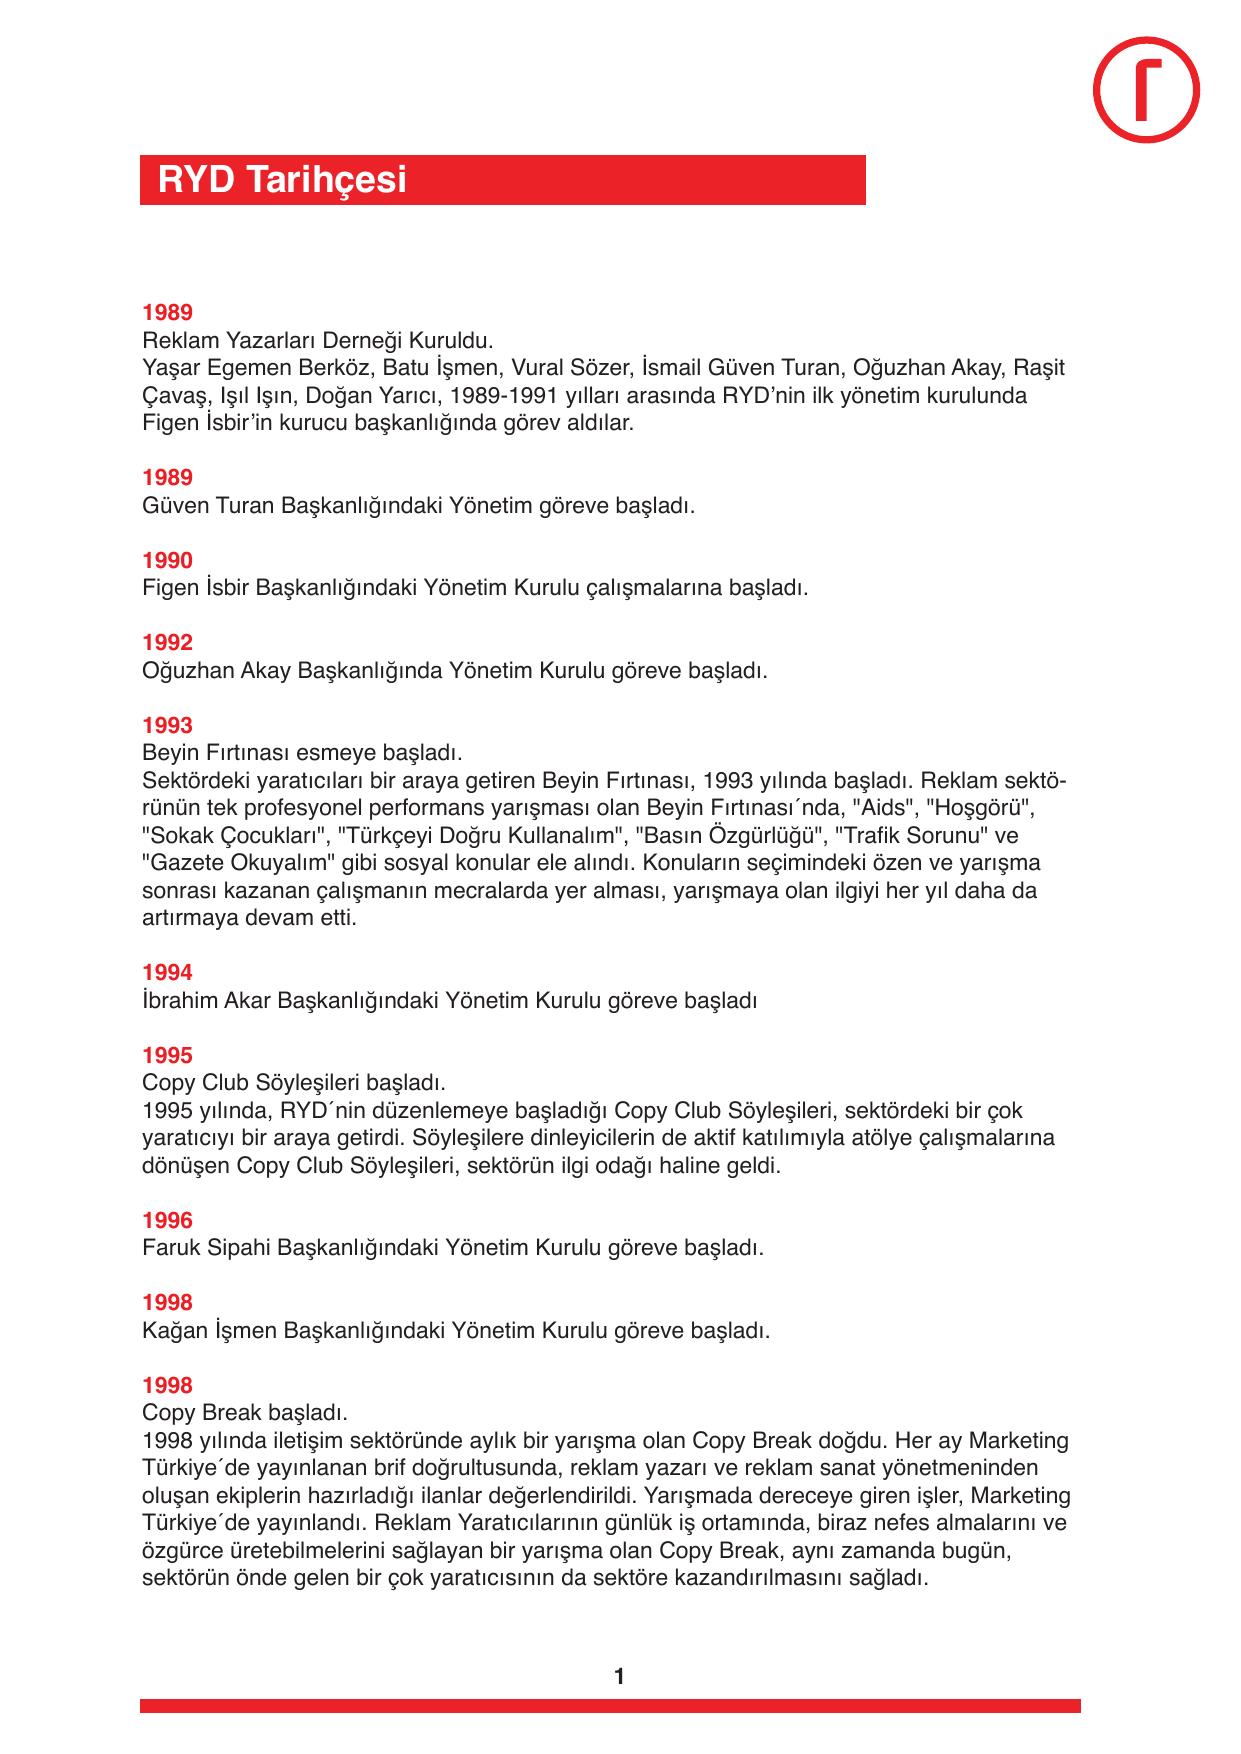 tapissier-lanoe.com - Sveriges Personligaste Rockmagasin